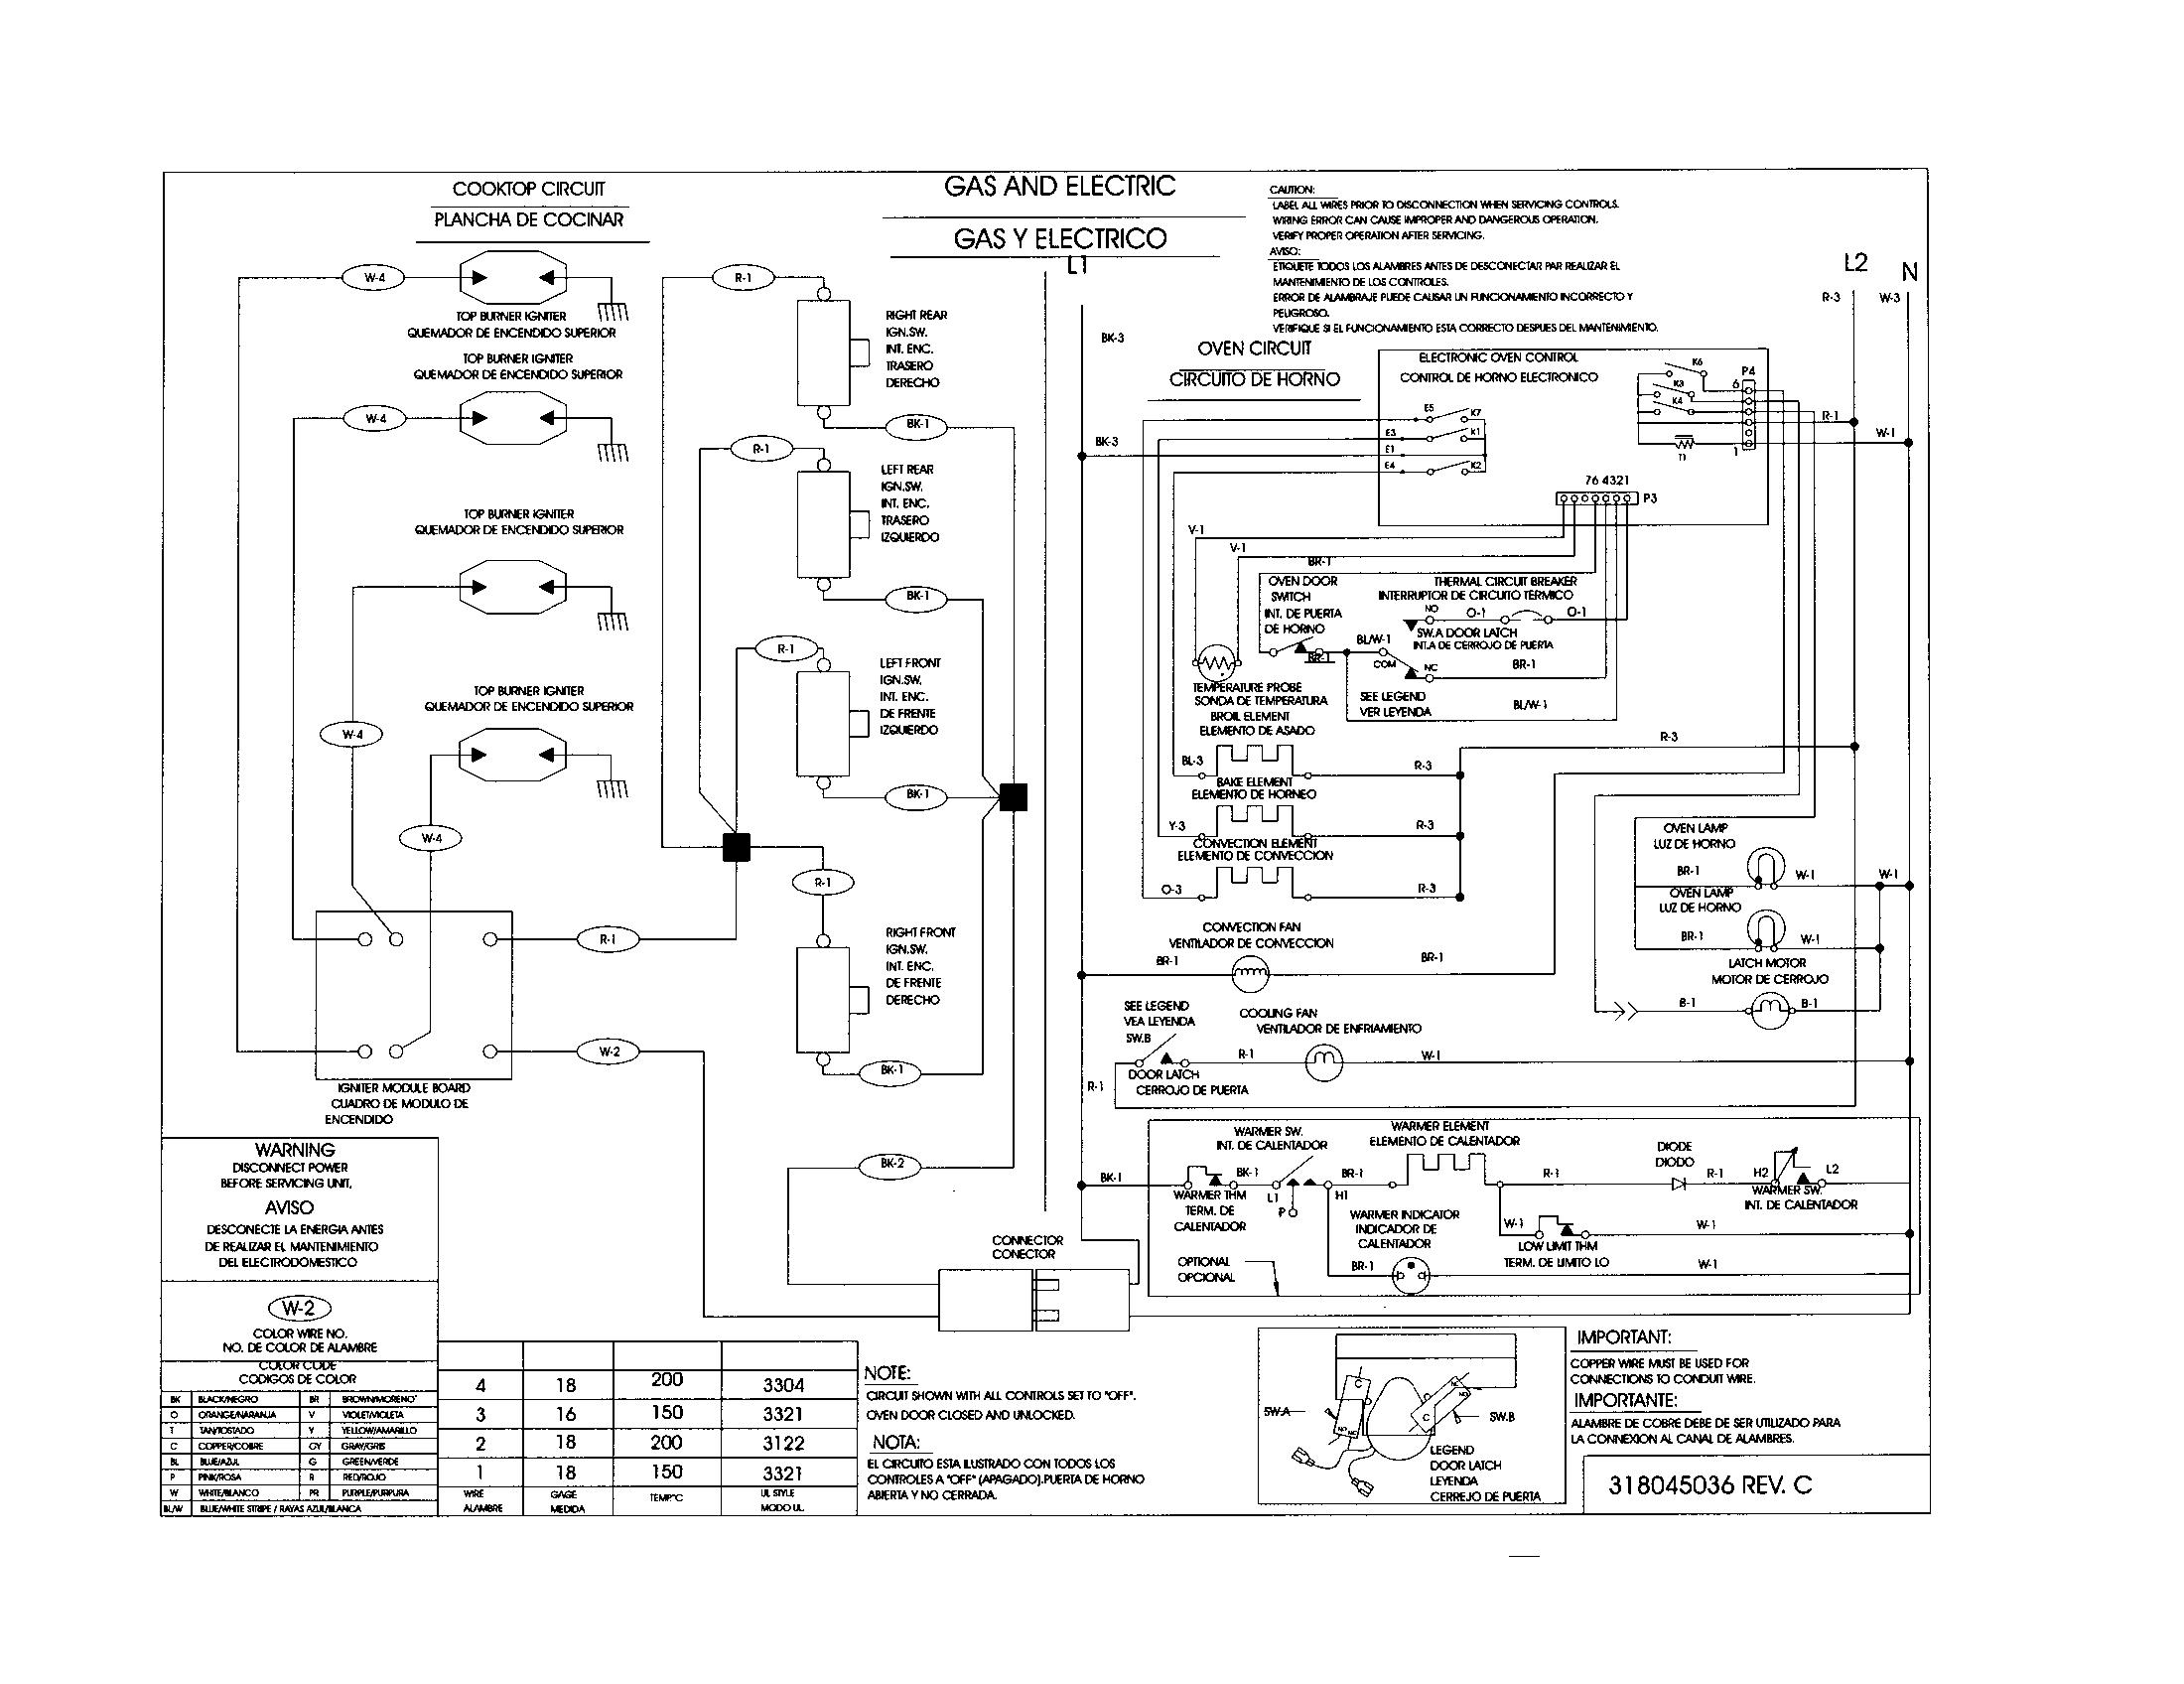 vg_2740] kenmore range wiring diagram switch wiring diagram  seve xlexi sapebe sequ usly mohammedshrine librar wiring 101